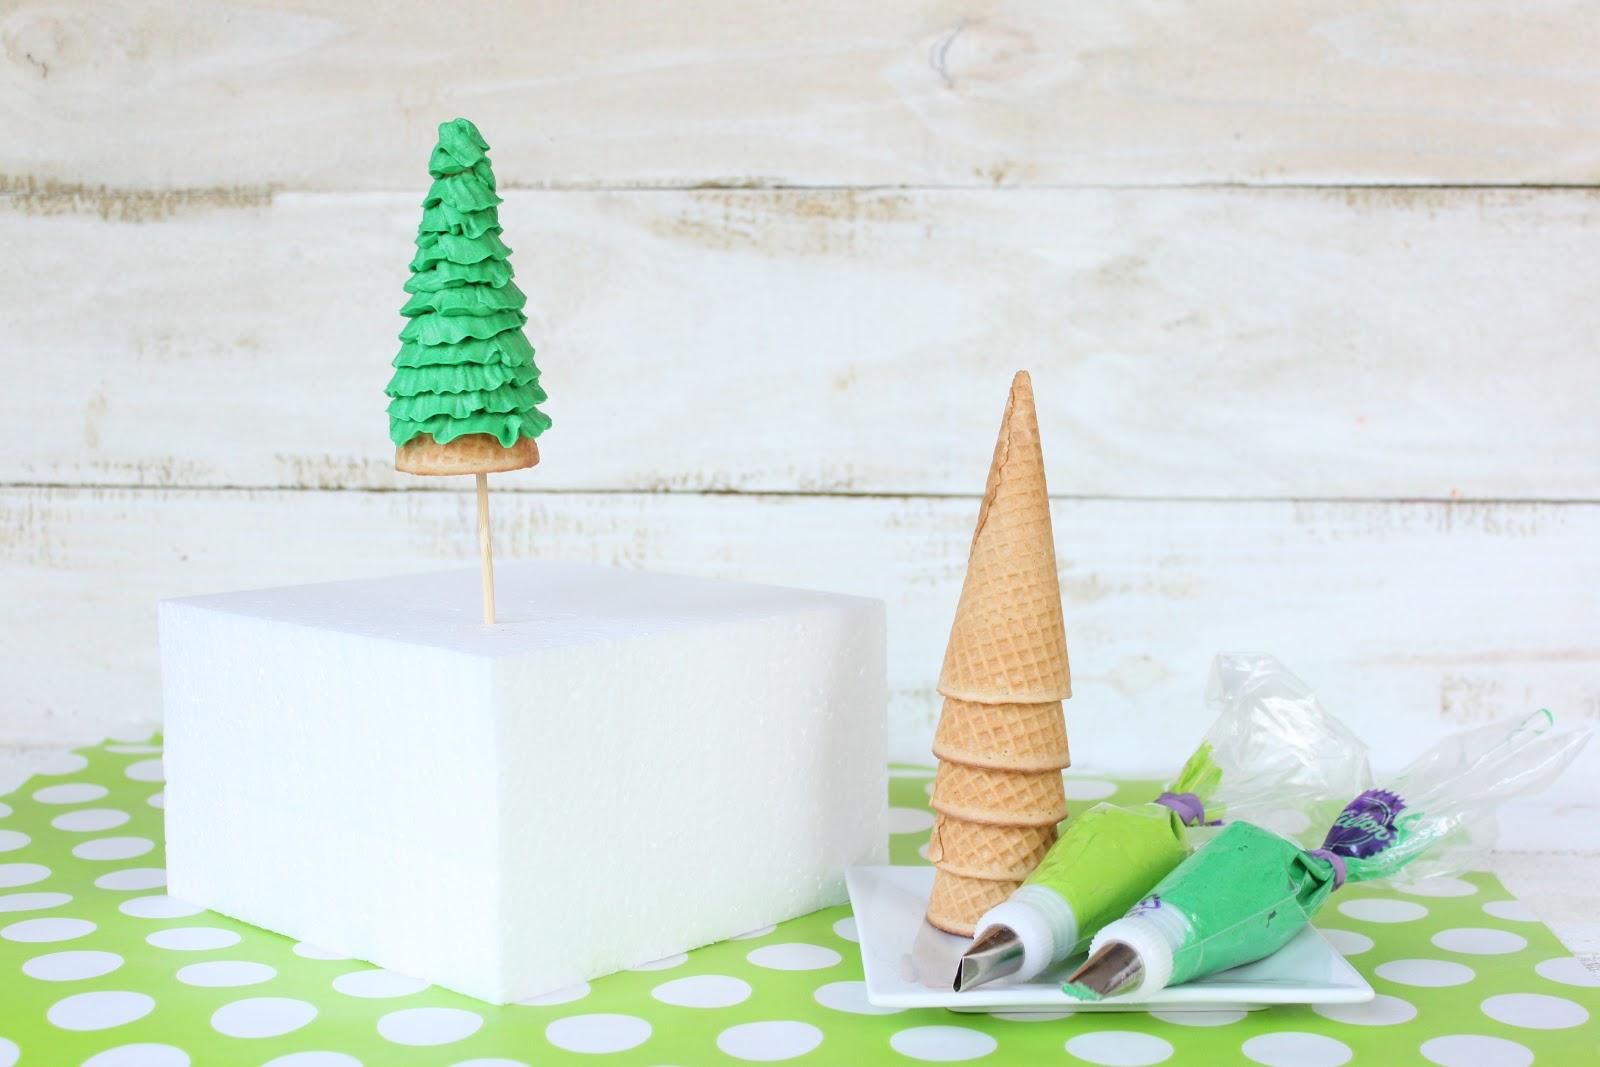 Crave. Indulge. Satisfy.: Ice Cream Cone Ruffle Tree Cake